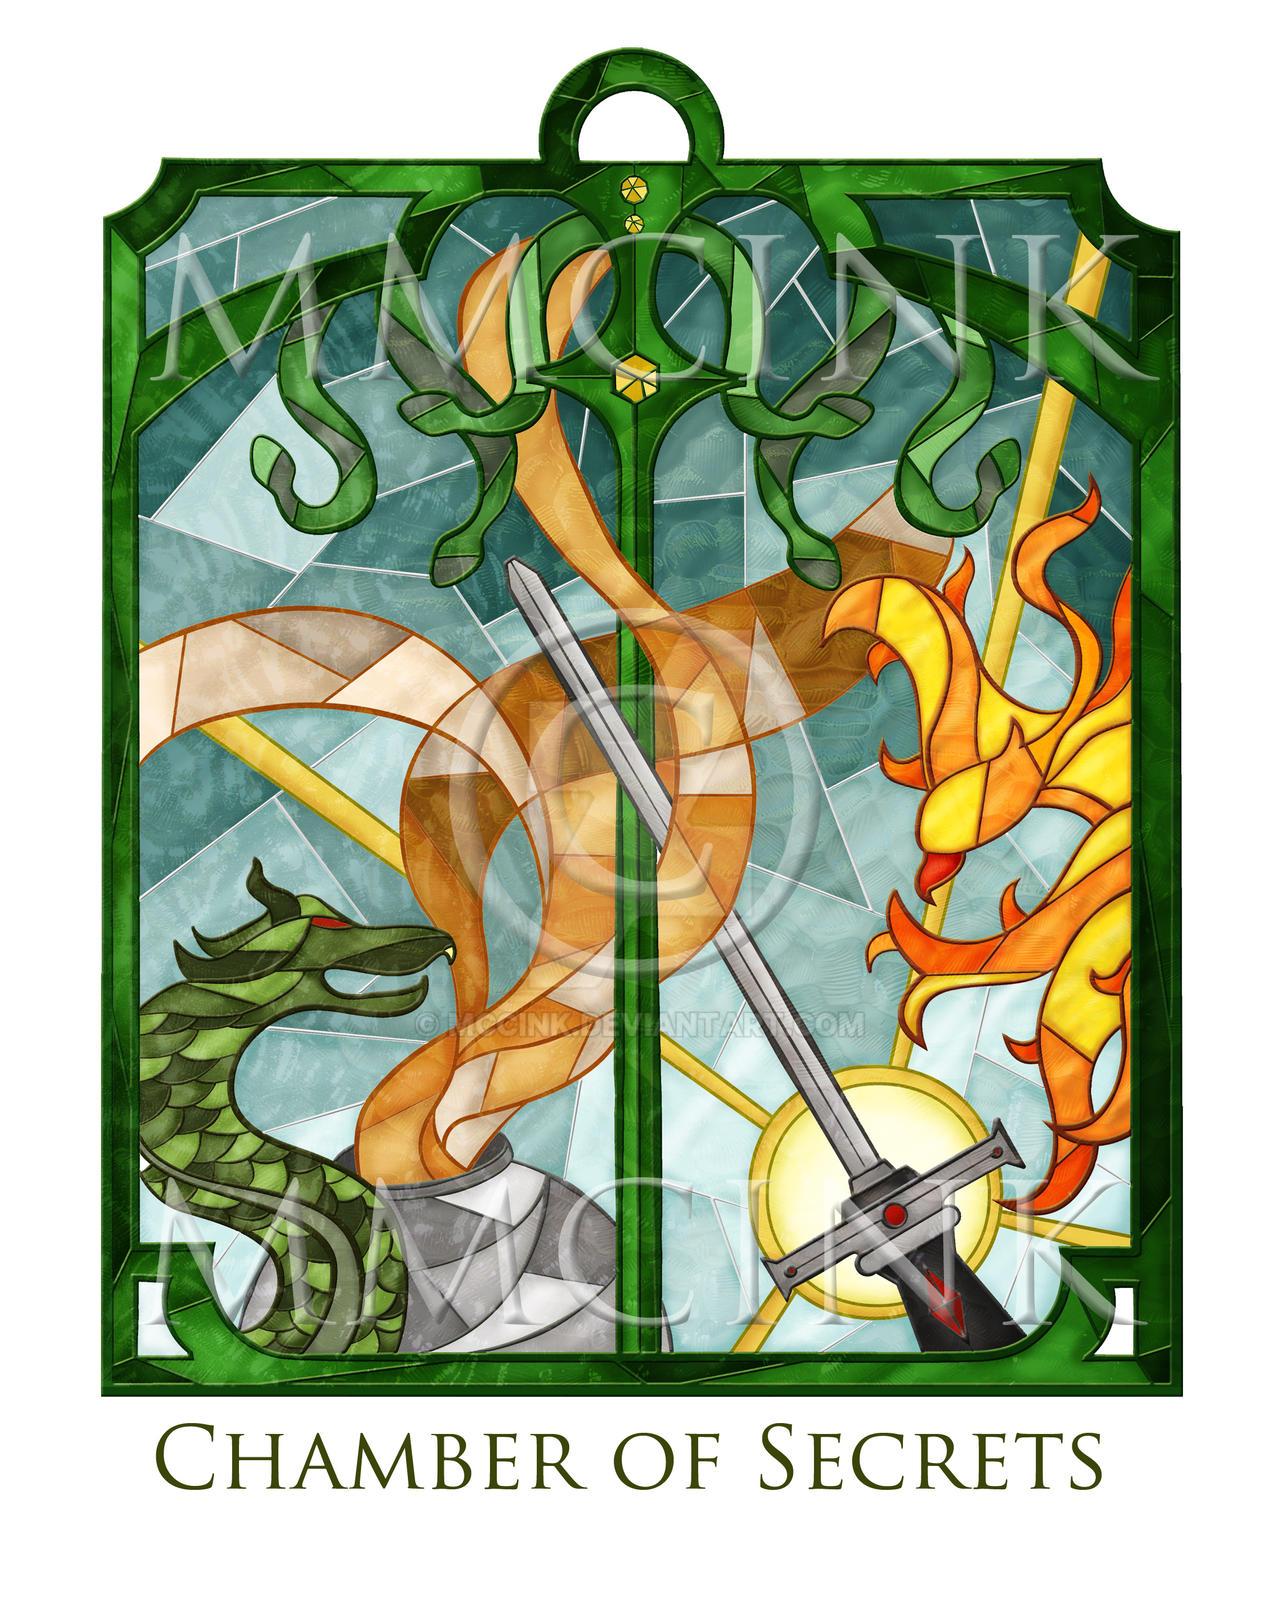 Magic Glass / Chamber of secrets by mccink